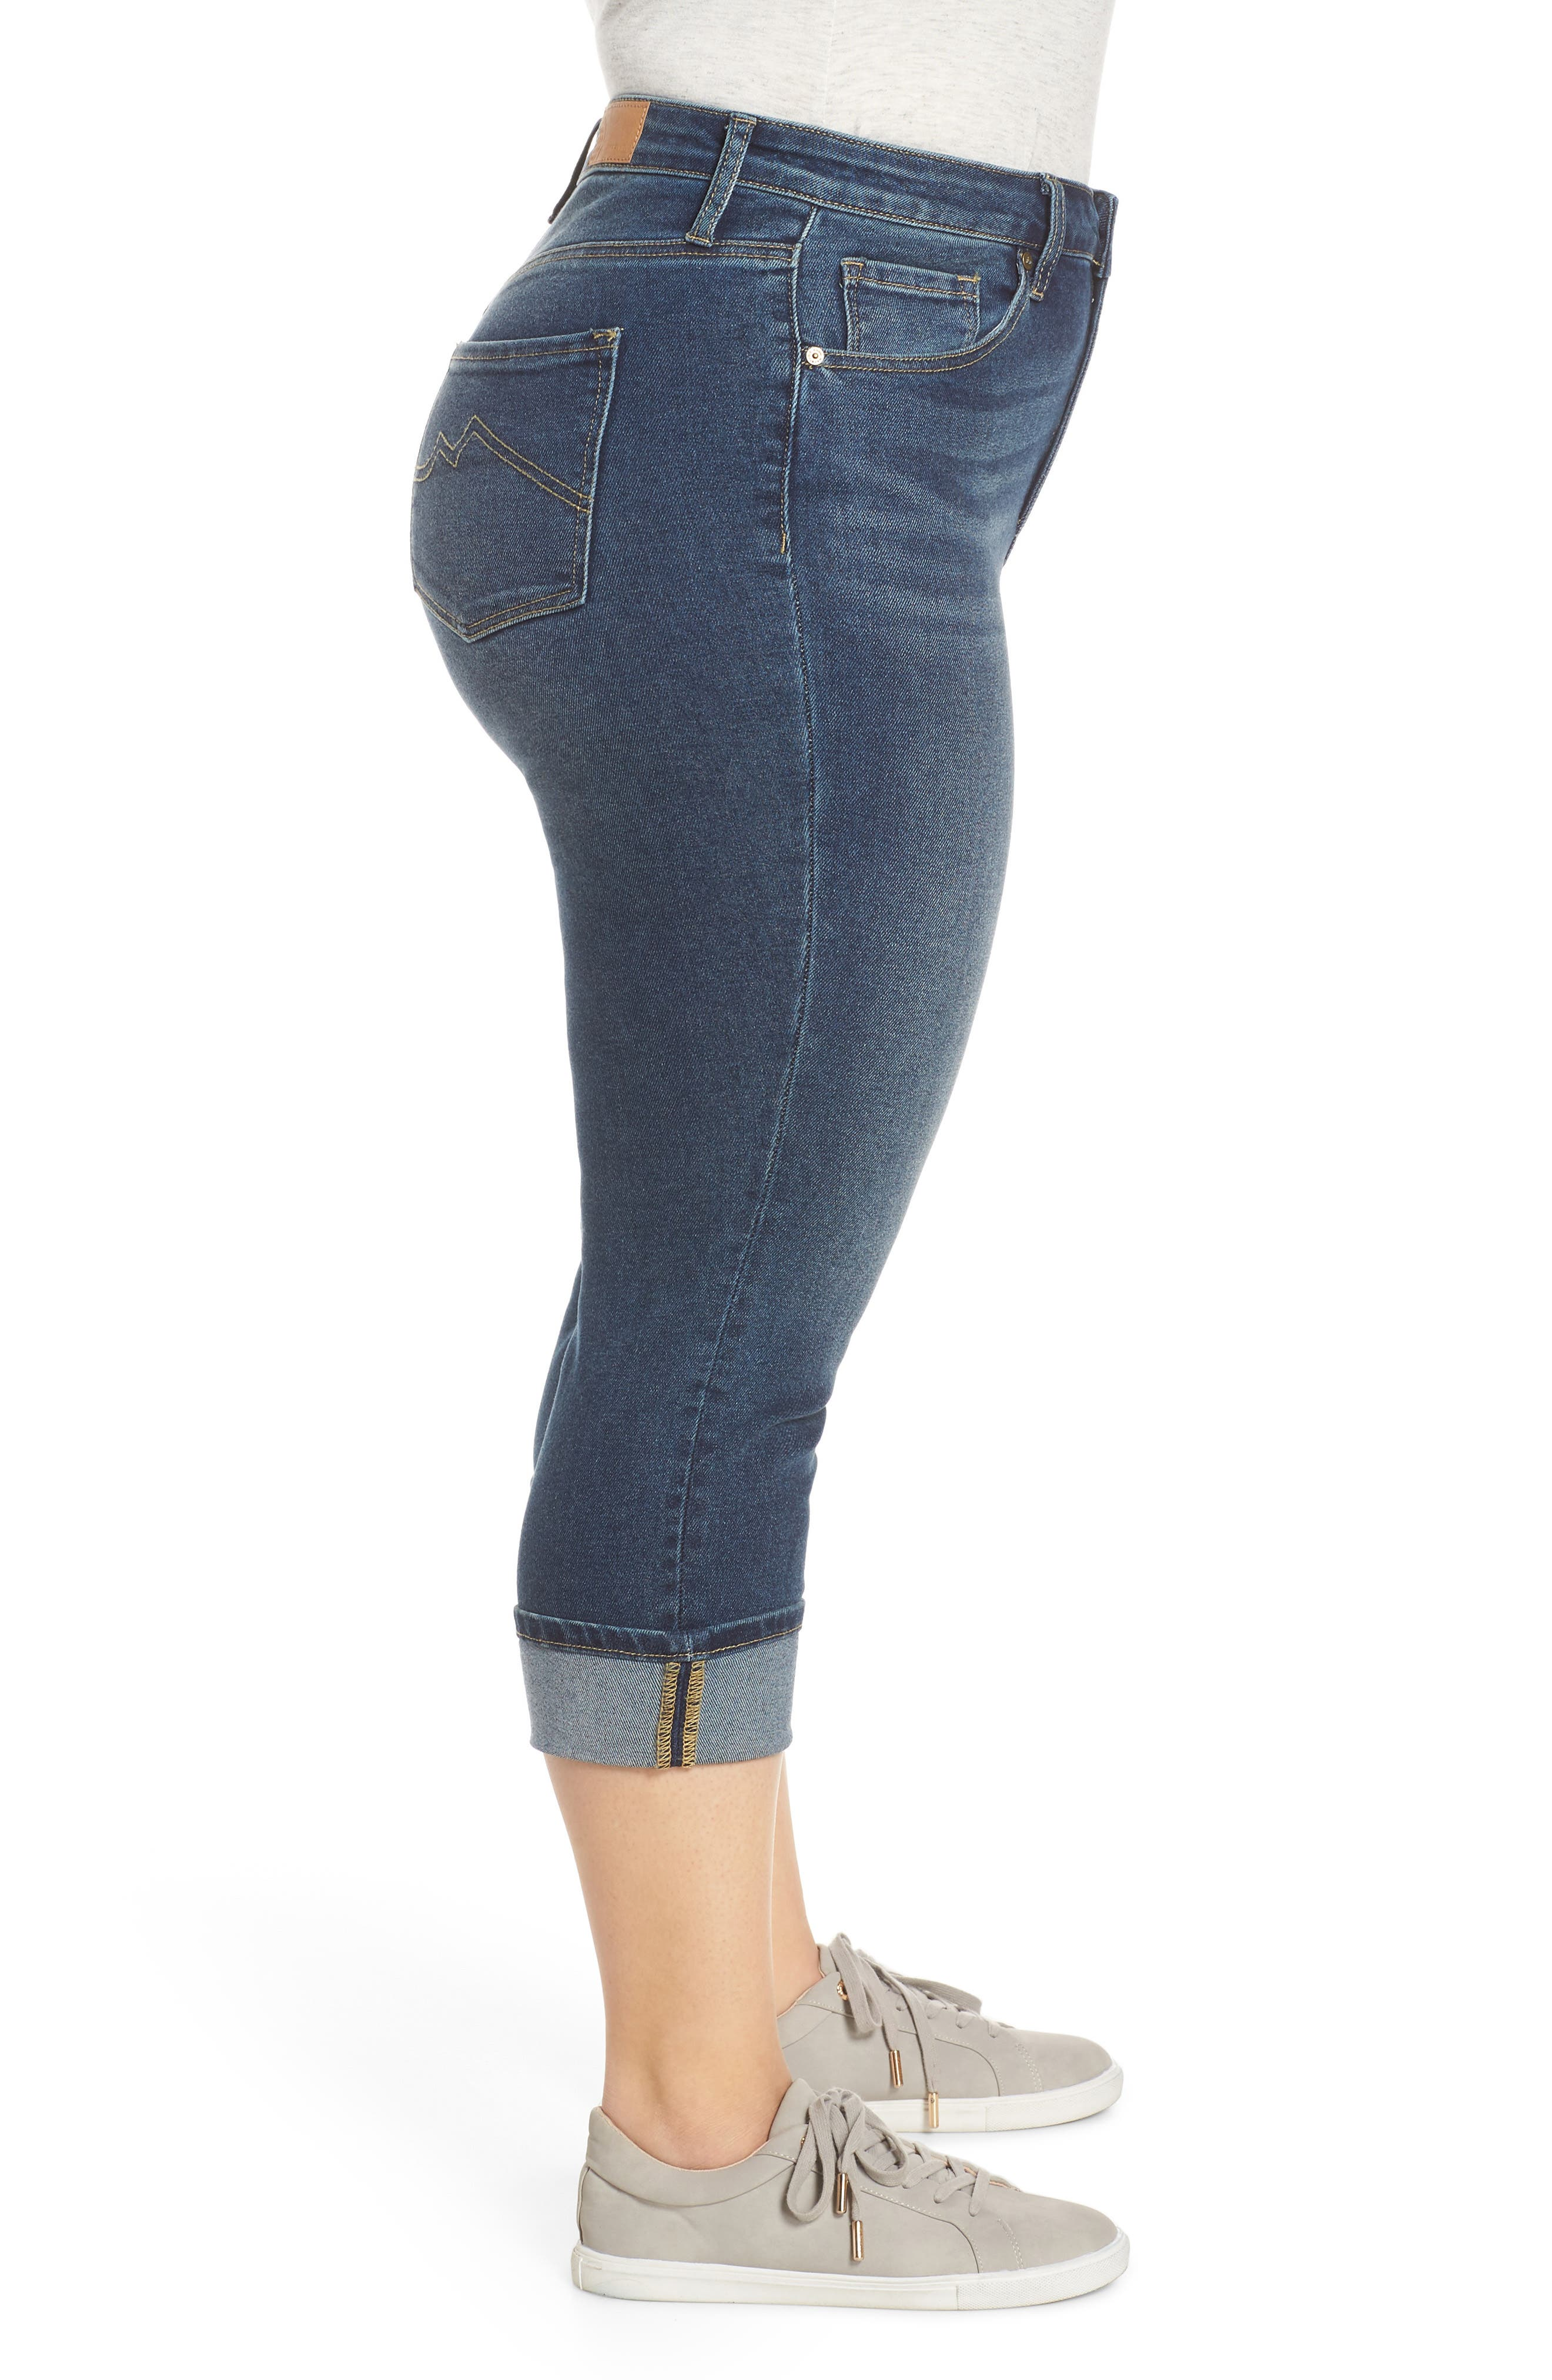 MAXSTUDIO INDIGO, High Waist Crop Skinny Jeans, Alternate thumbnail 4, color, JADE